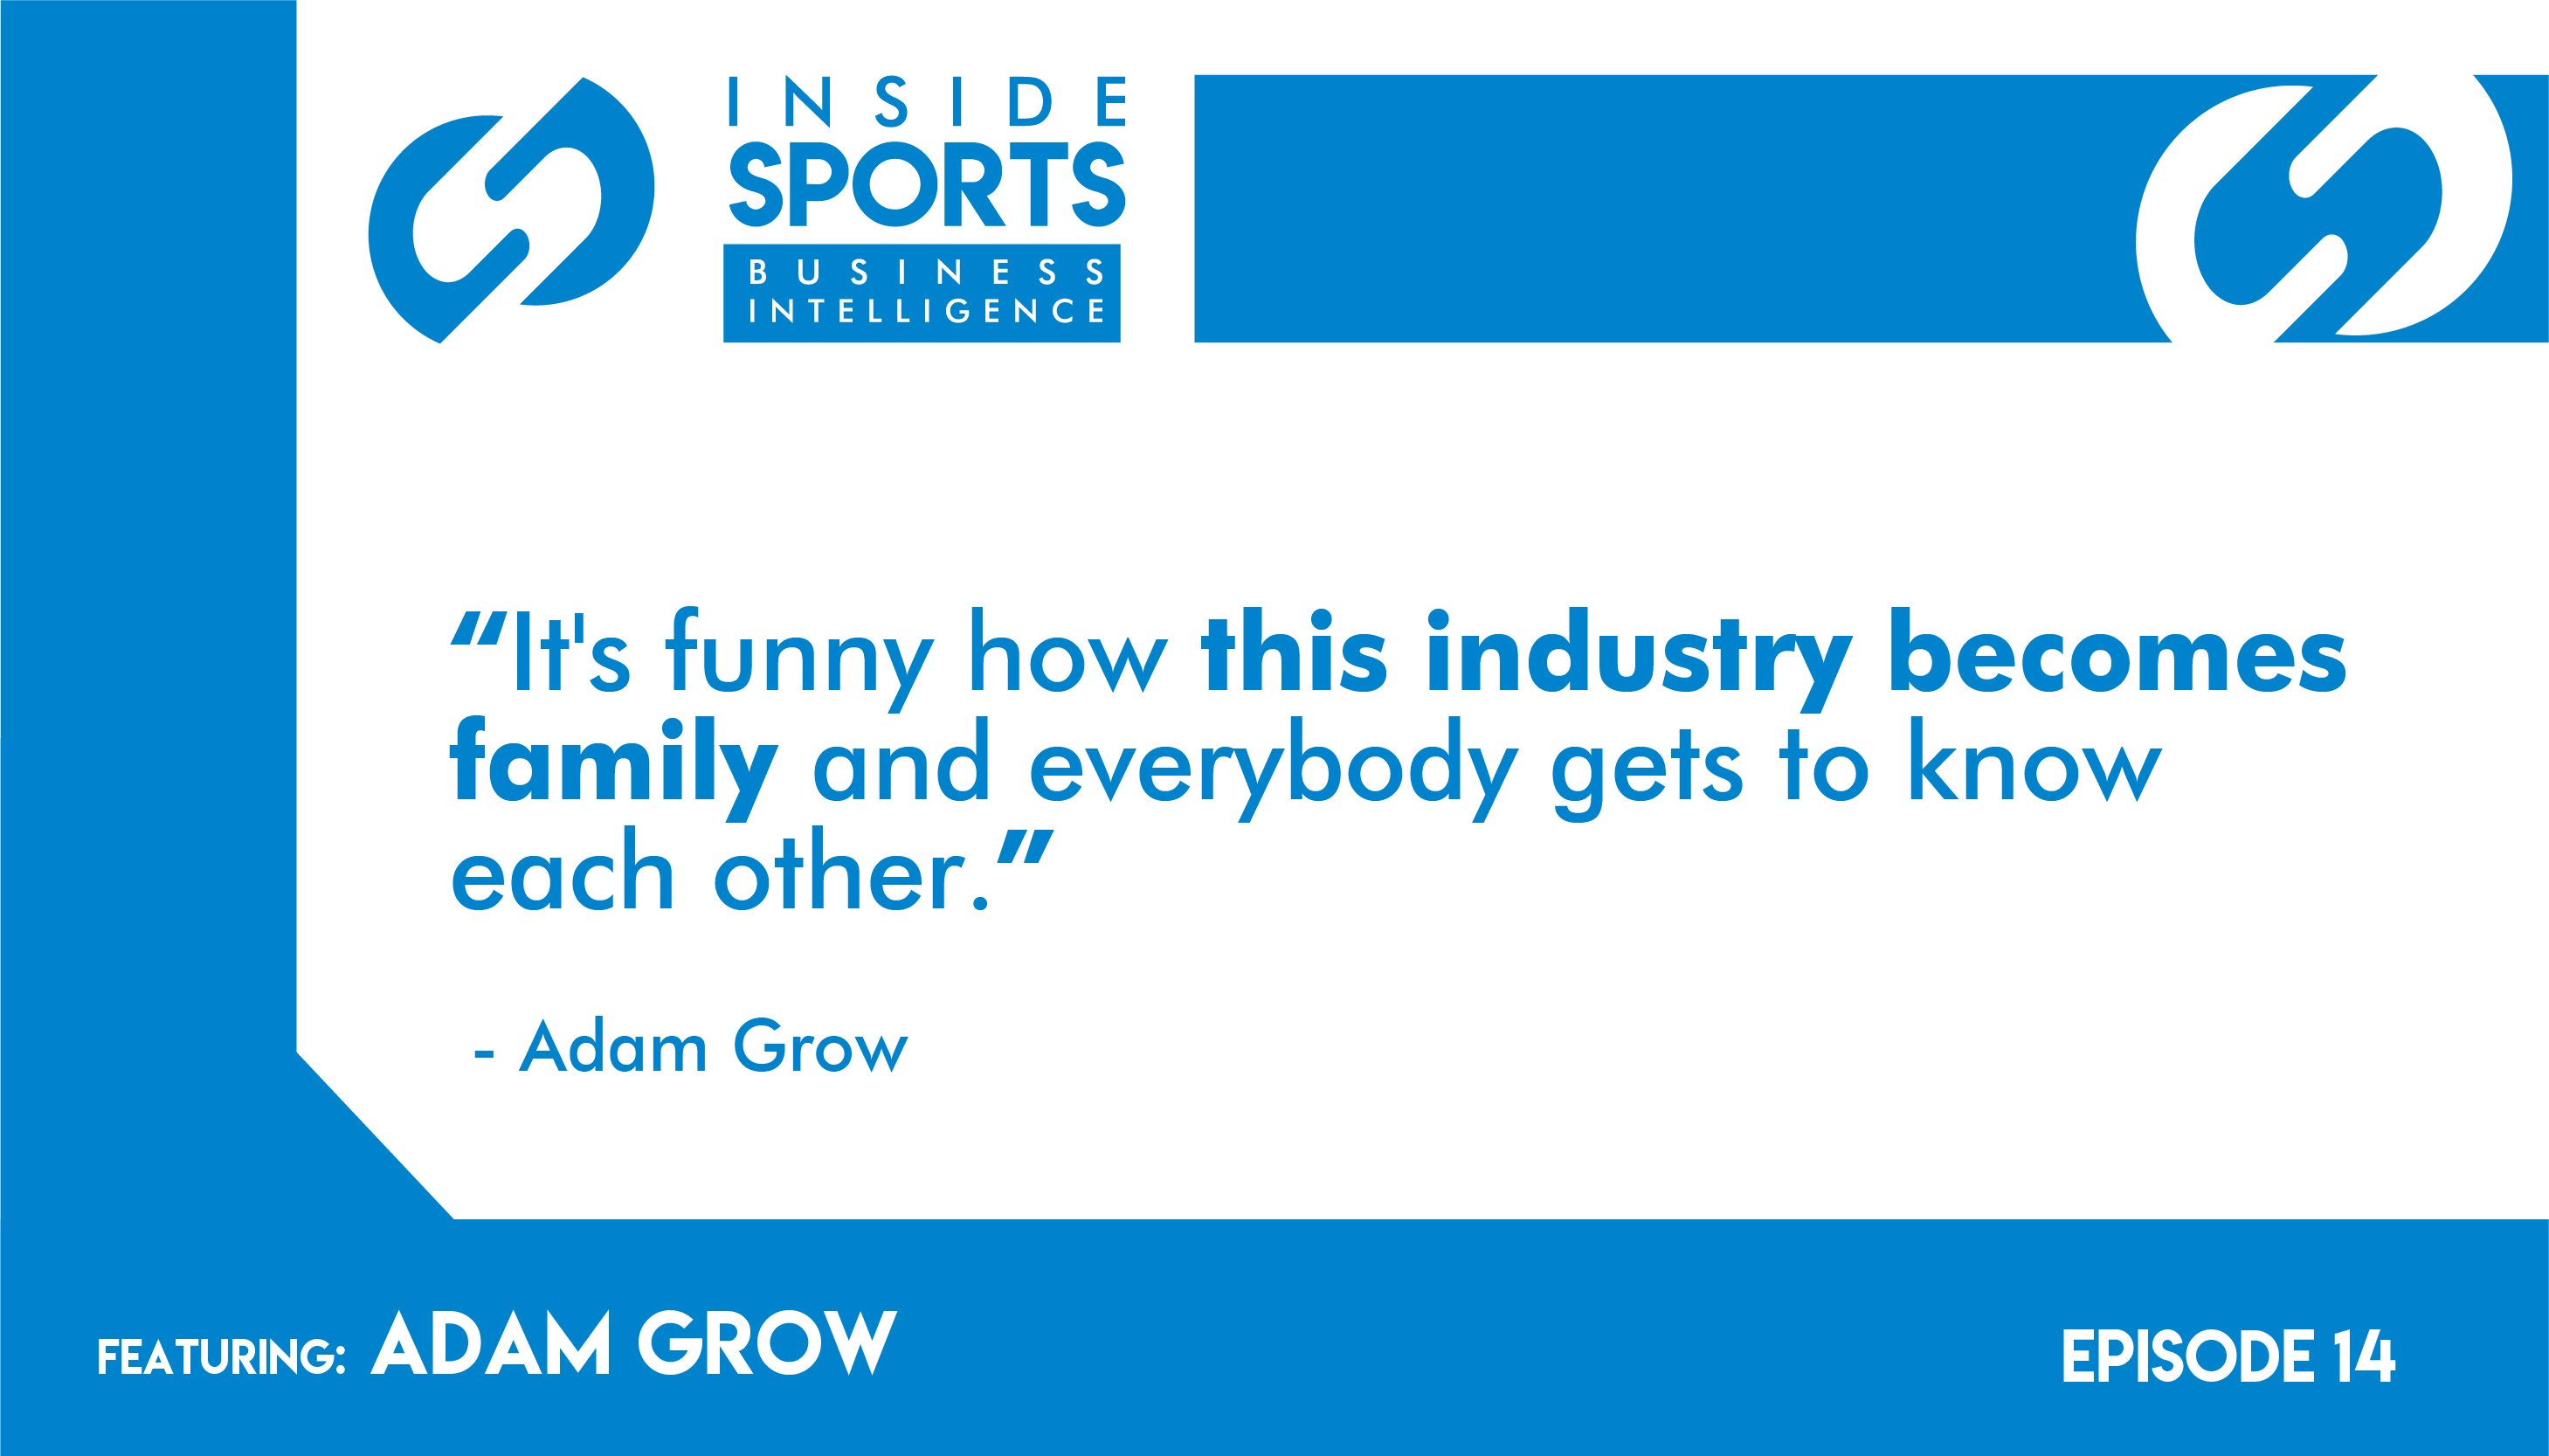 adam-grow-quote